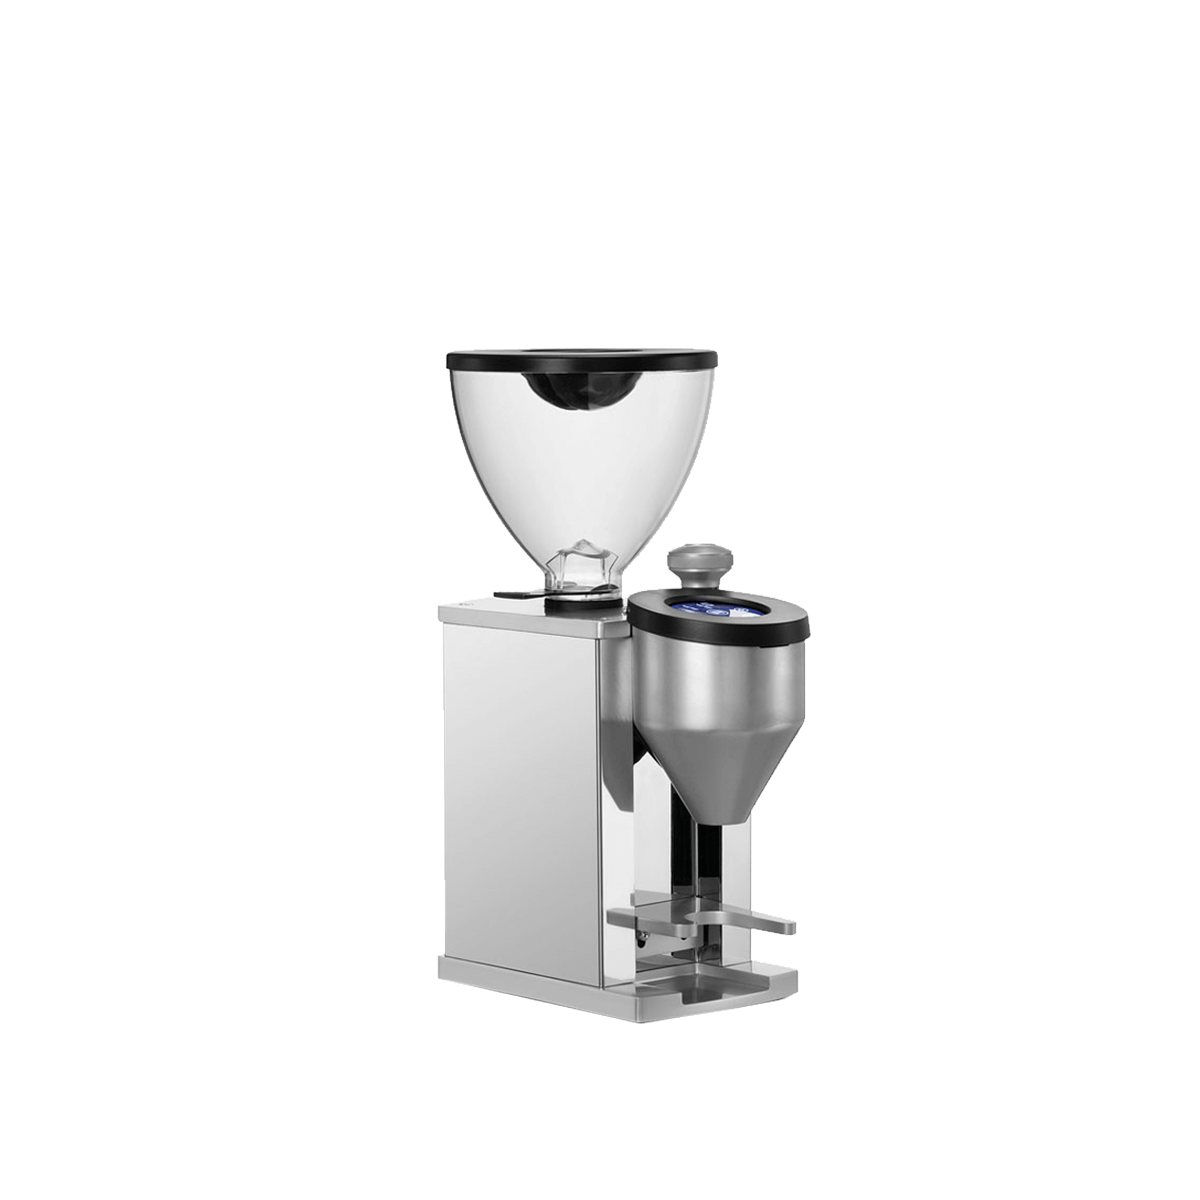 Coffee Grinder – Rocket Espresso Faustino Chrome